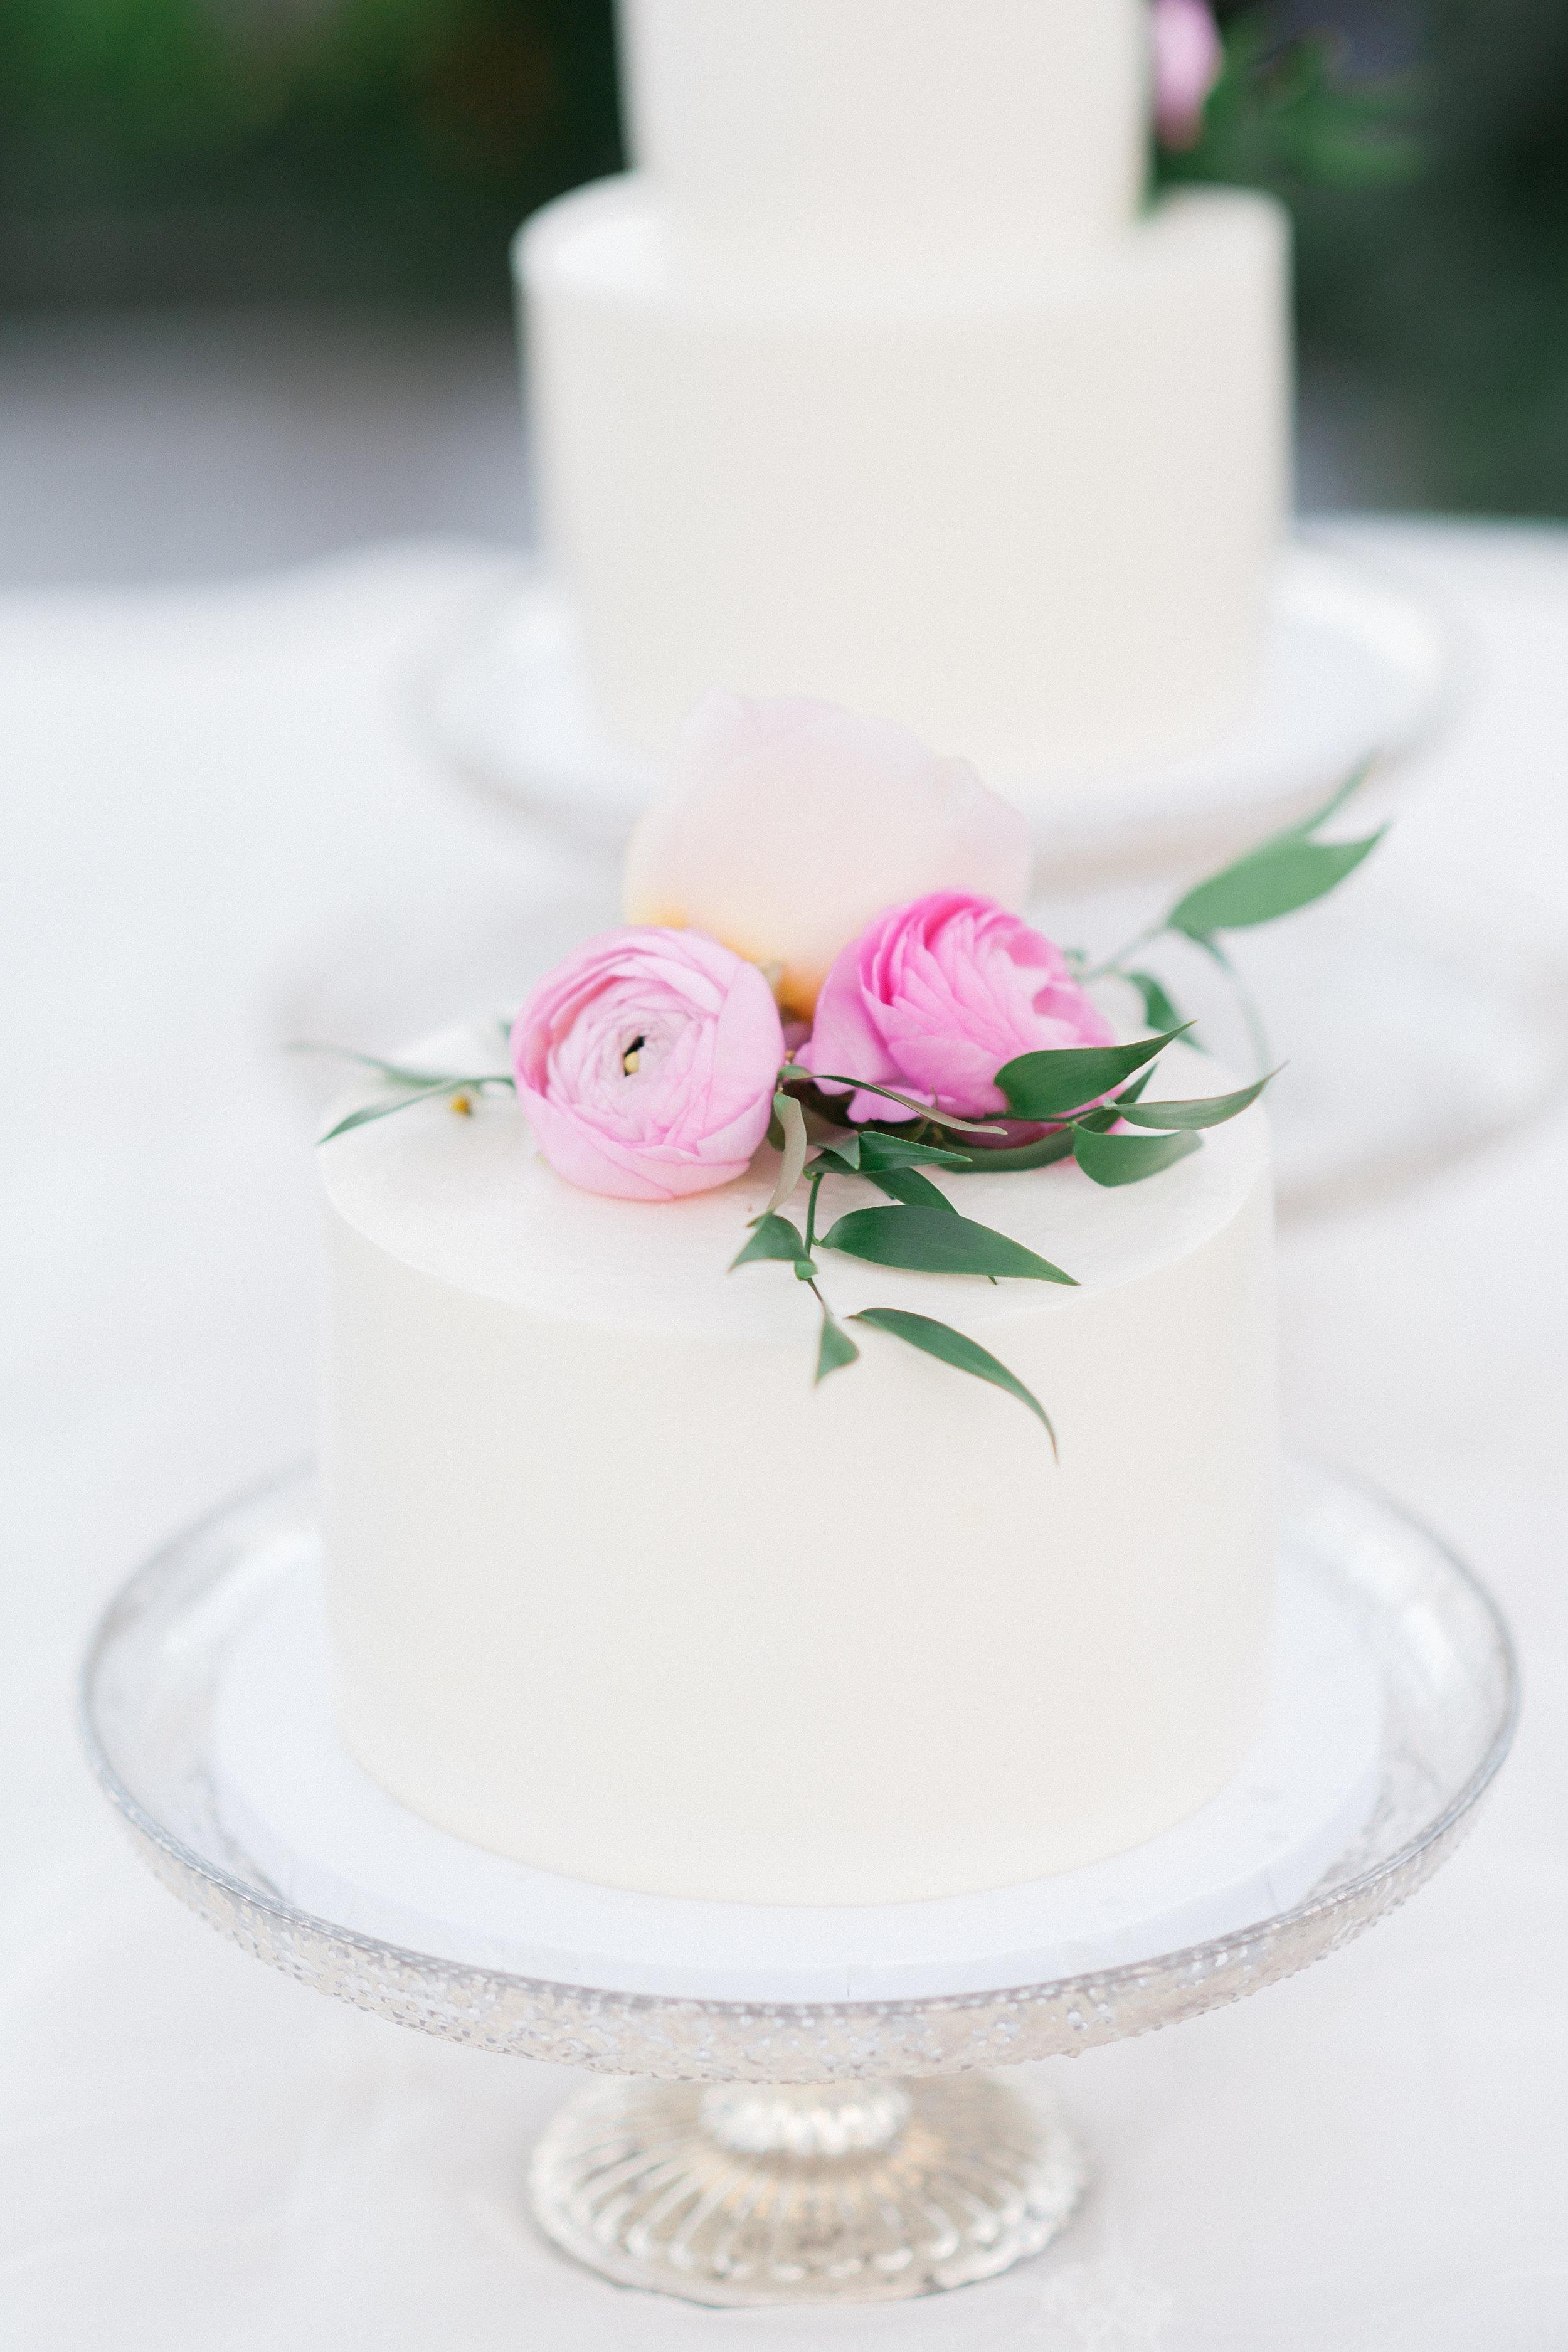 Mercury Glass Cake Stands $10 sm, $12 lrg